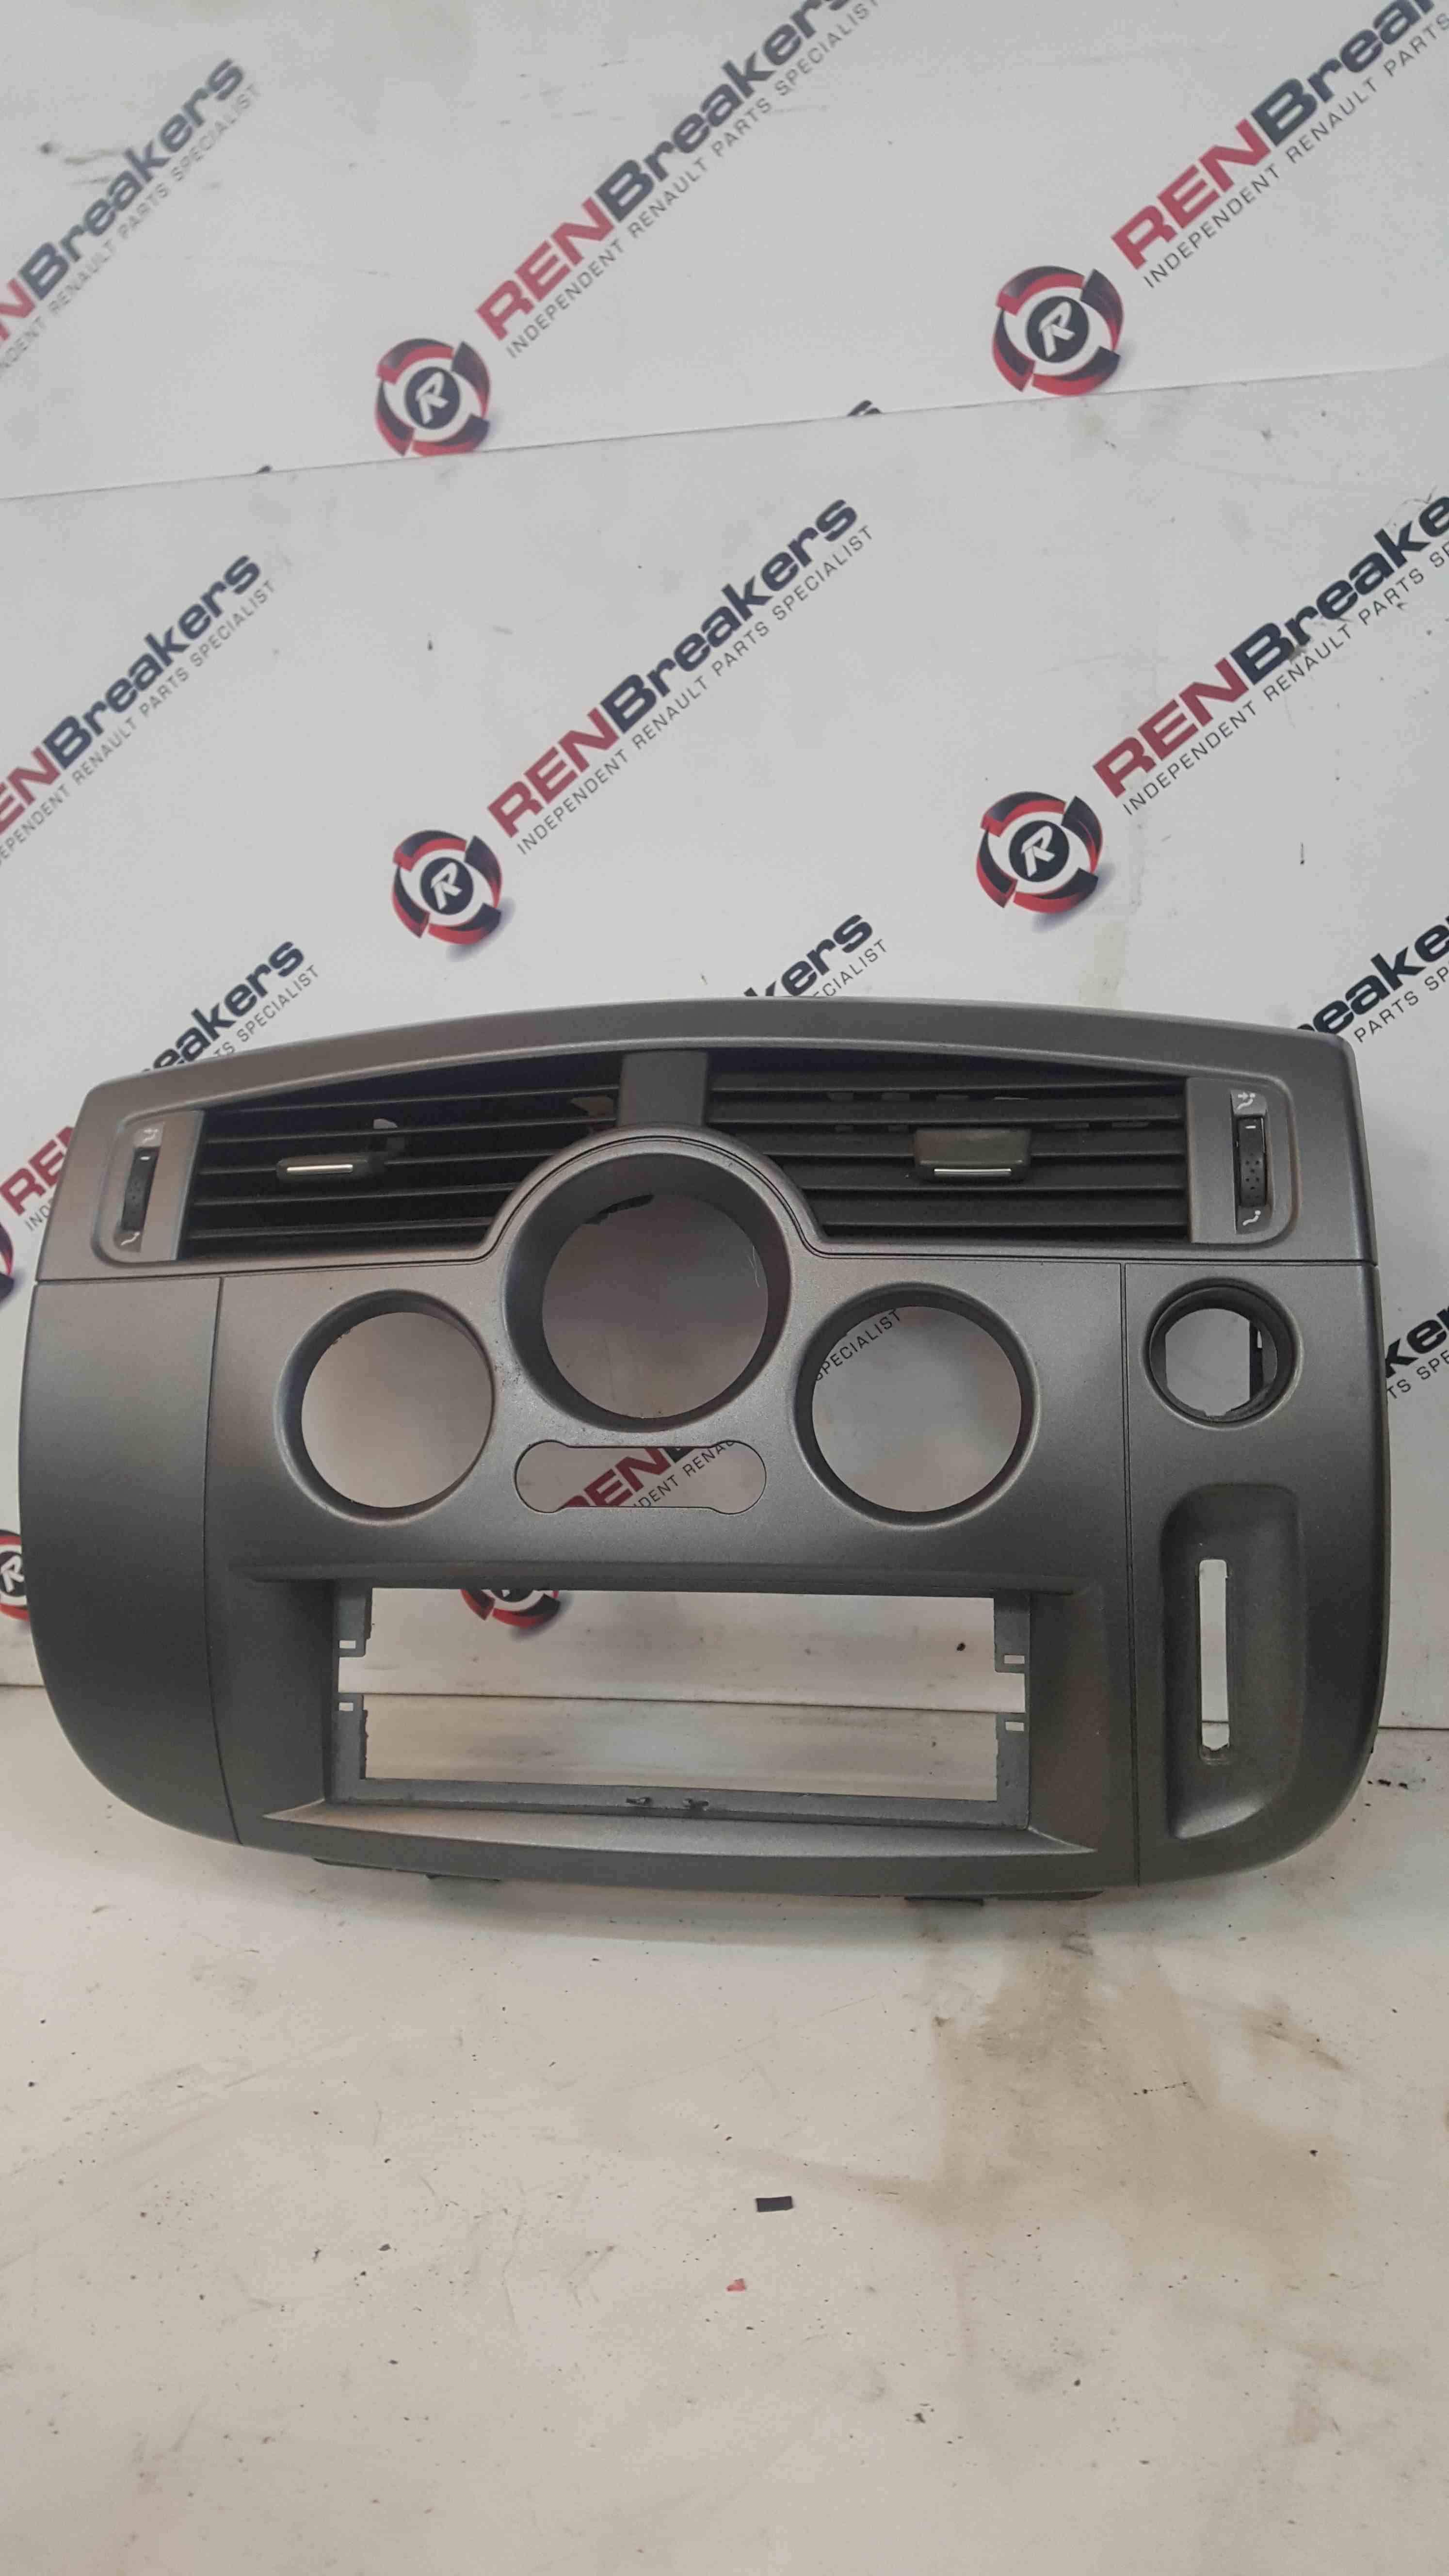 Renault Scenic MK2 2003-2009 Heater Cd Player Surround Trim Panel